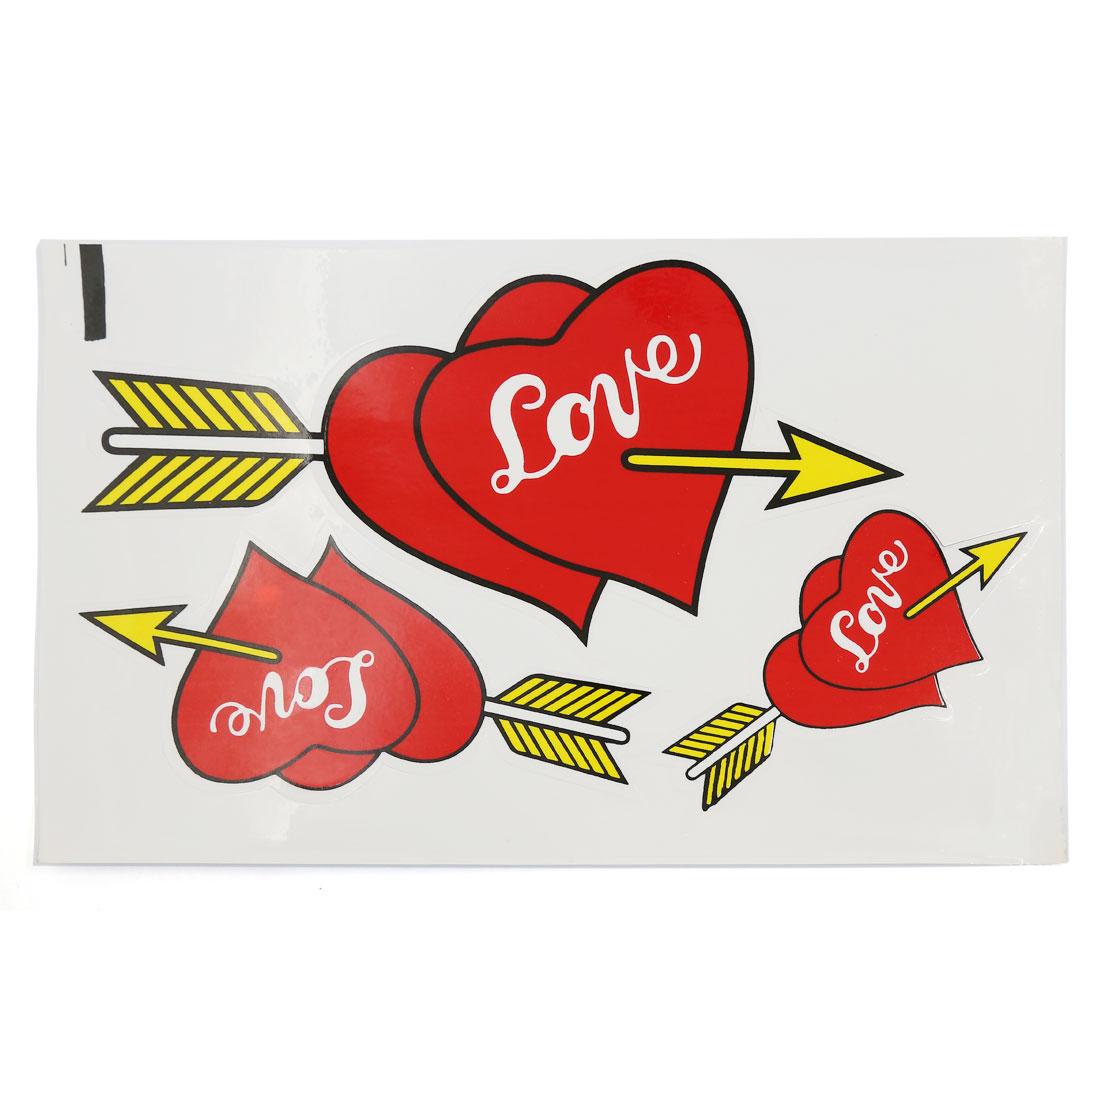 Car Body Ornament Arrow Through Hearts Design Graphic Decal Vinyl Sticker Decor